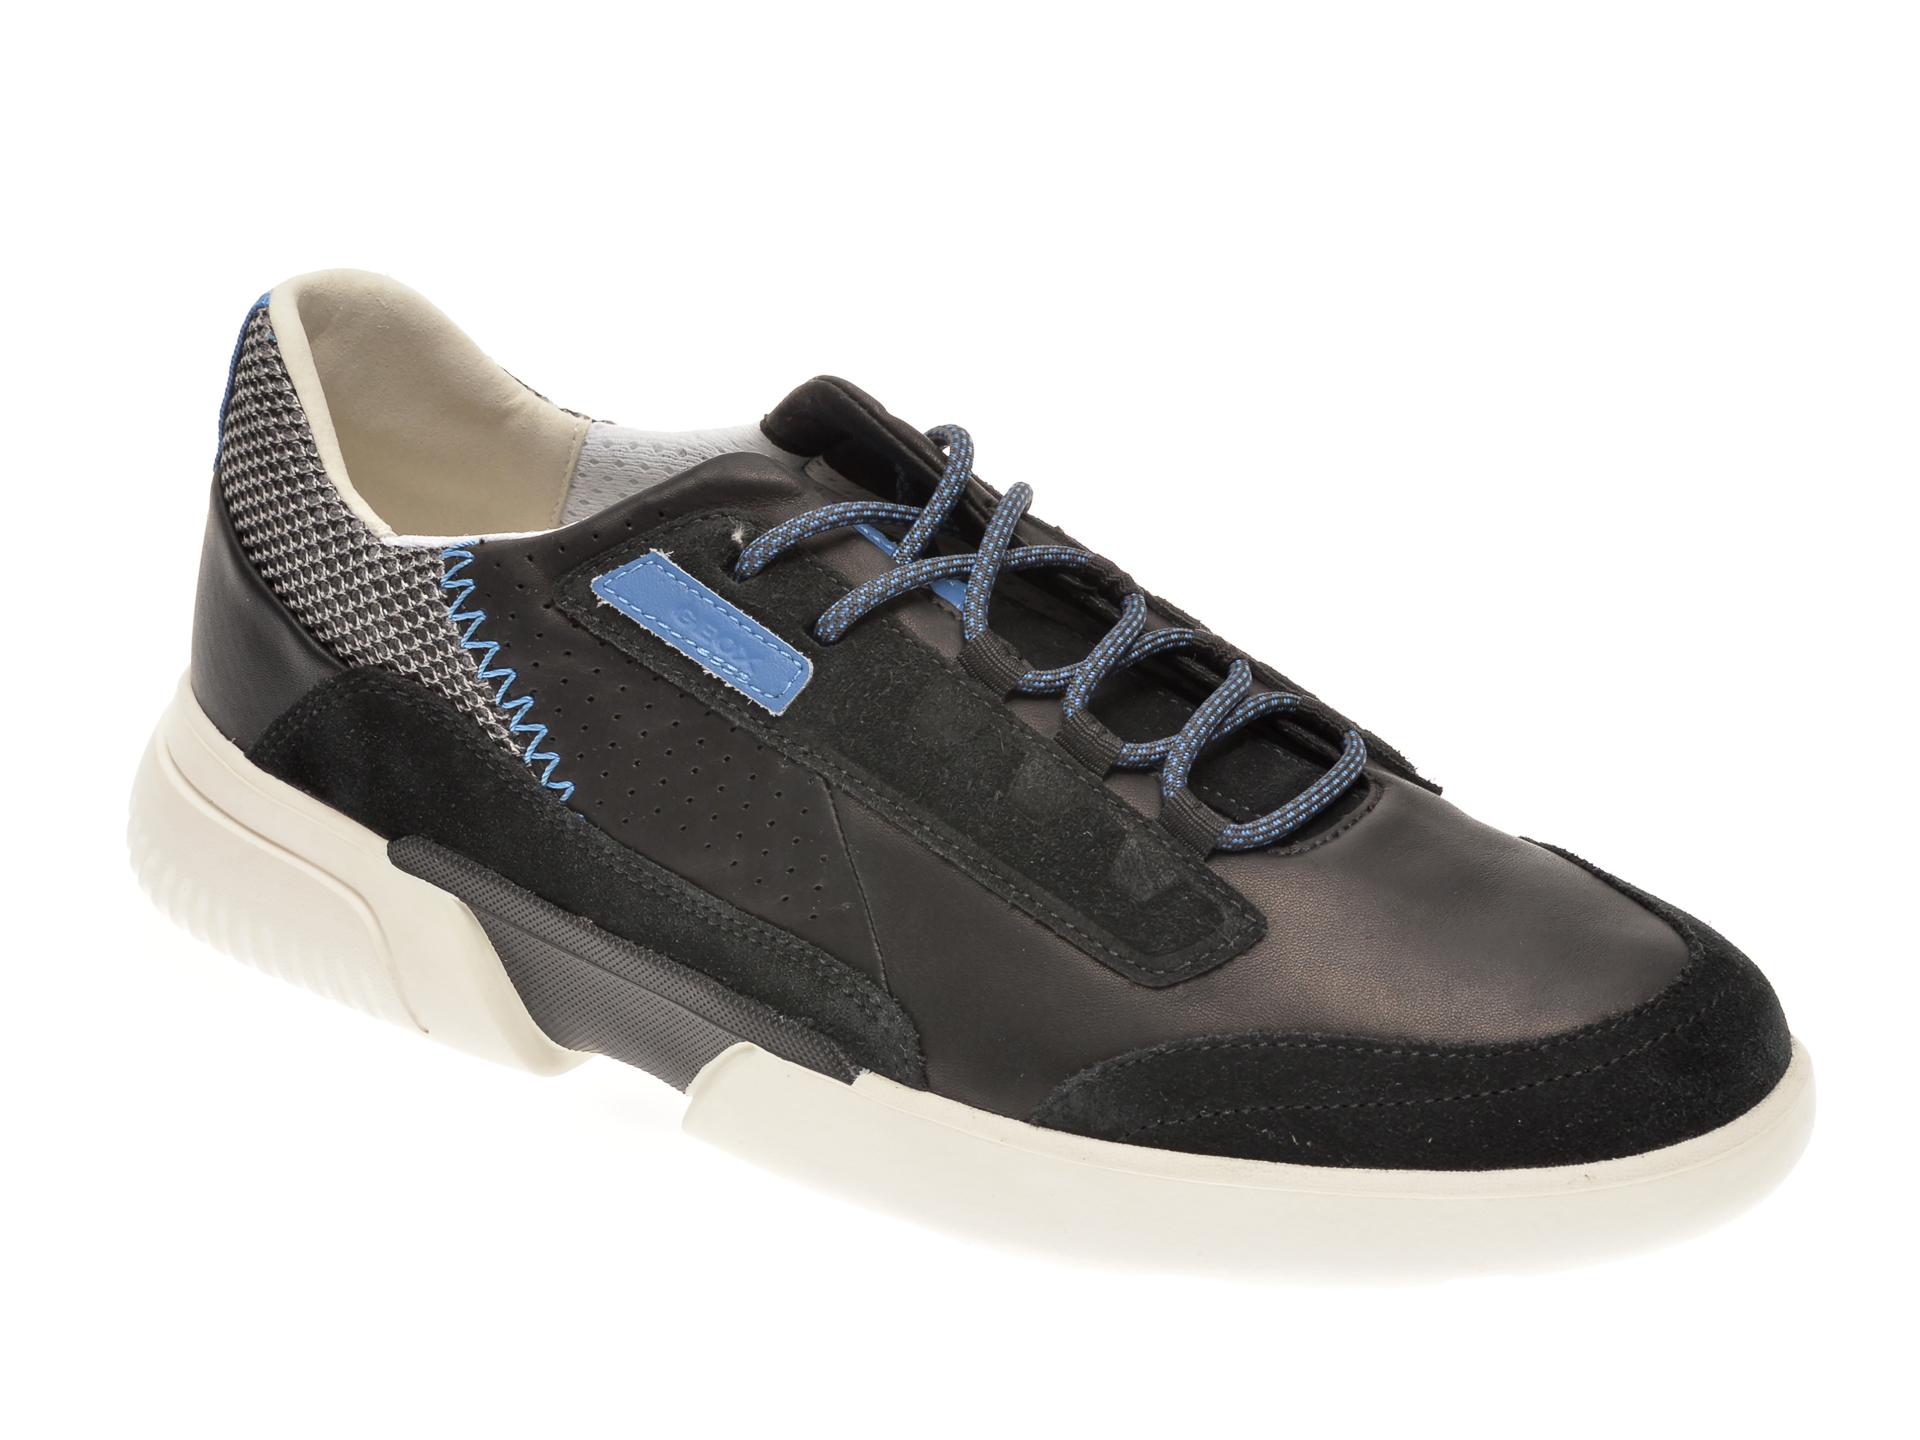 Pantofi Sport Geox Negri, U04afa, Din Piele Naturala